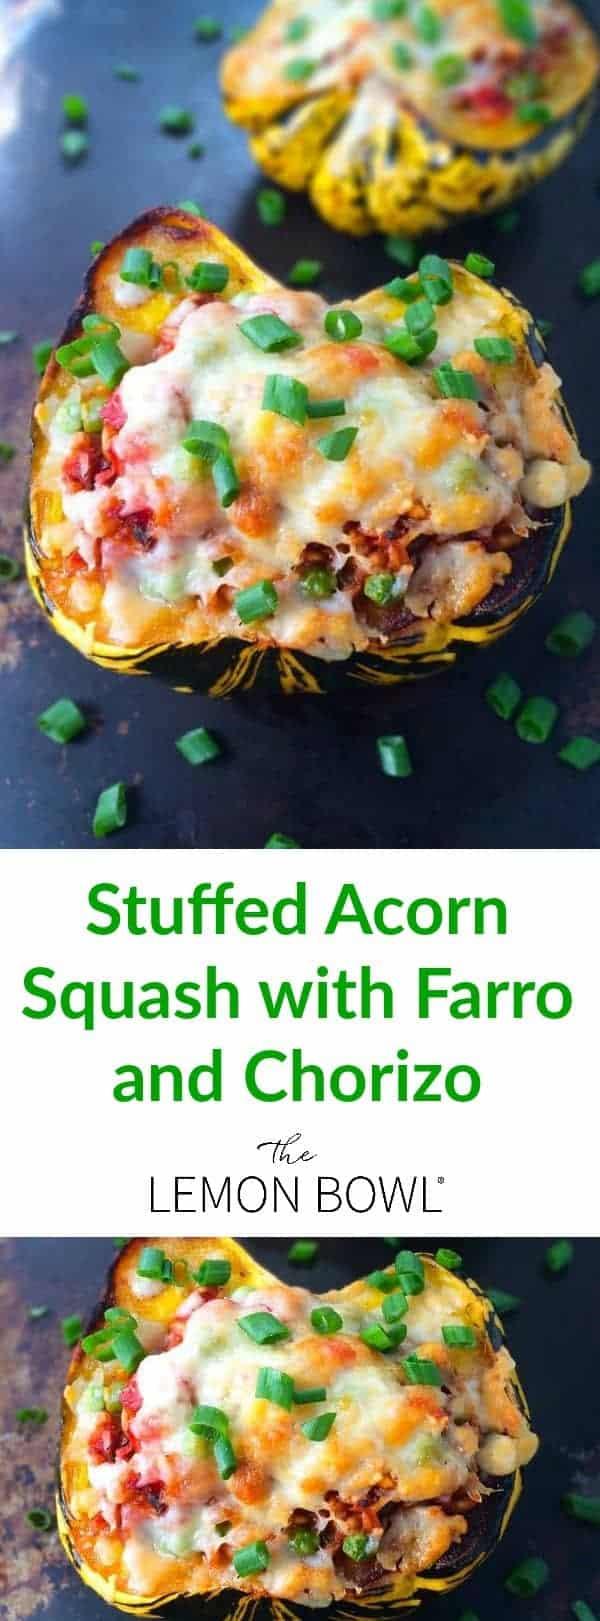 Stuffed Acorn Squash with Farro and Chorizo